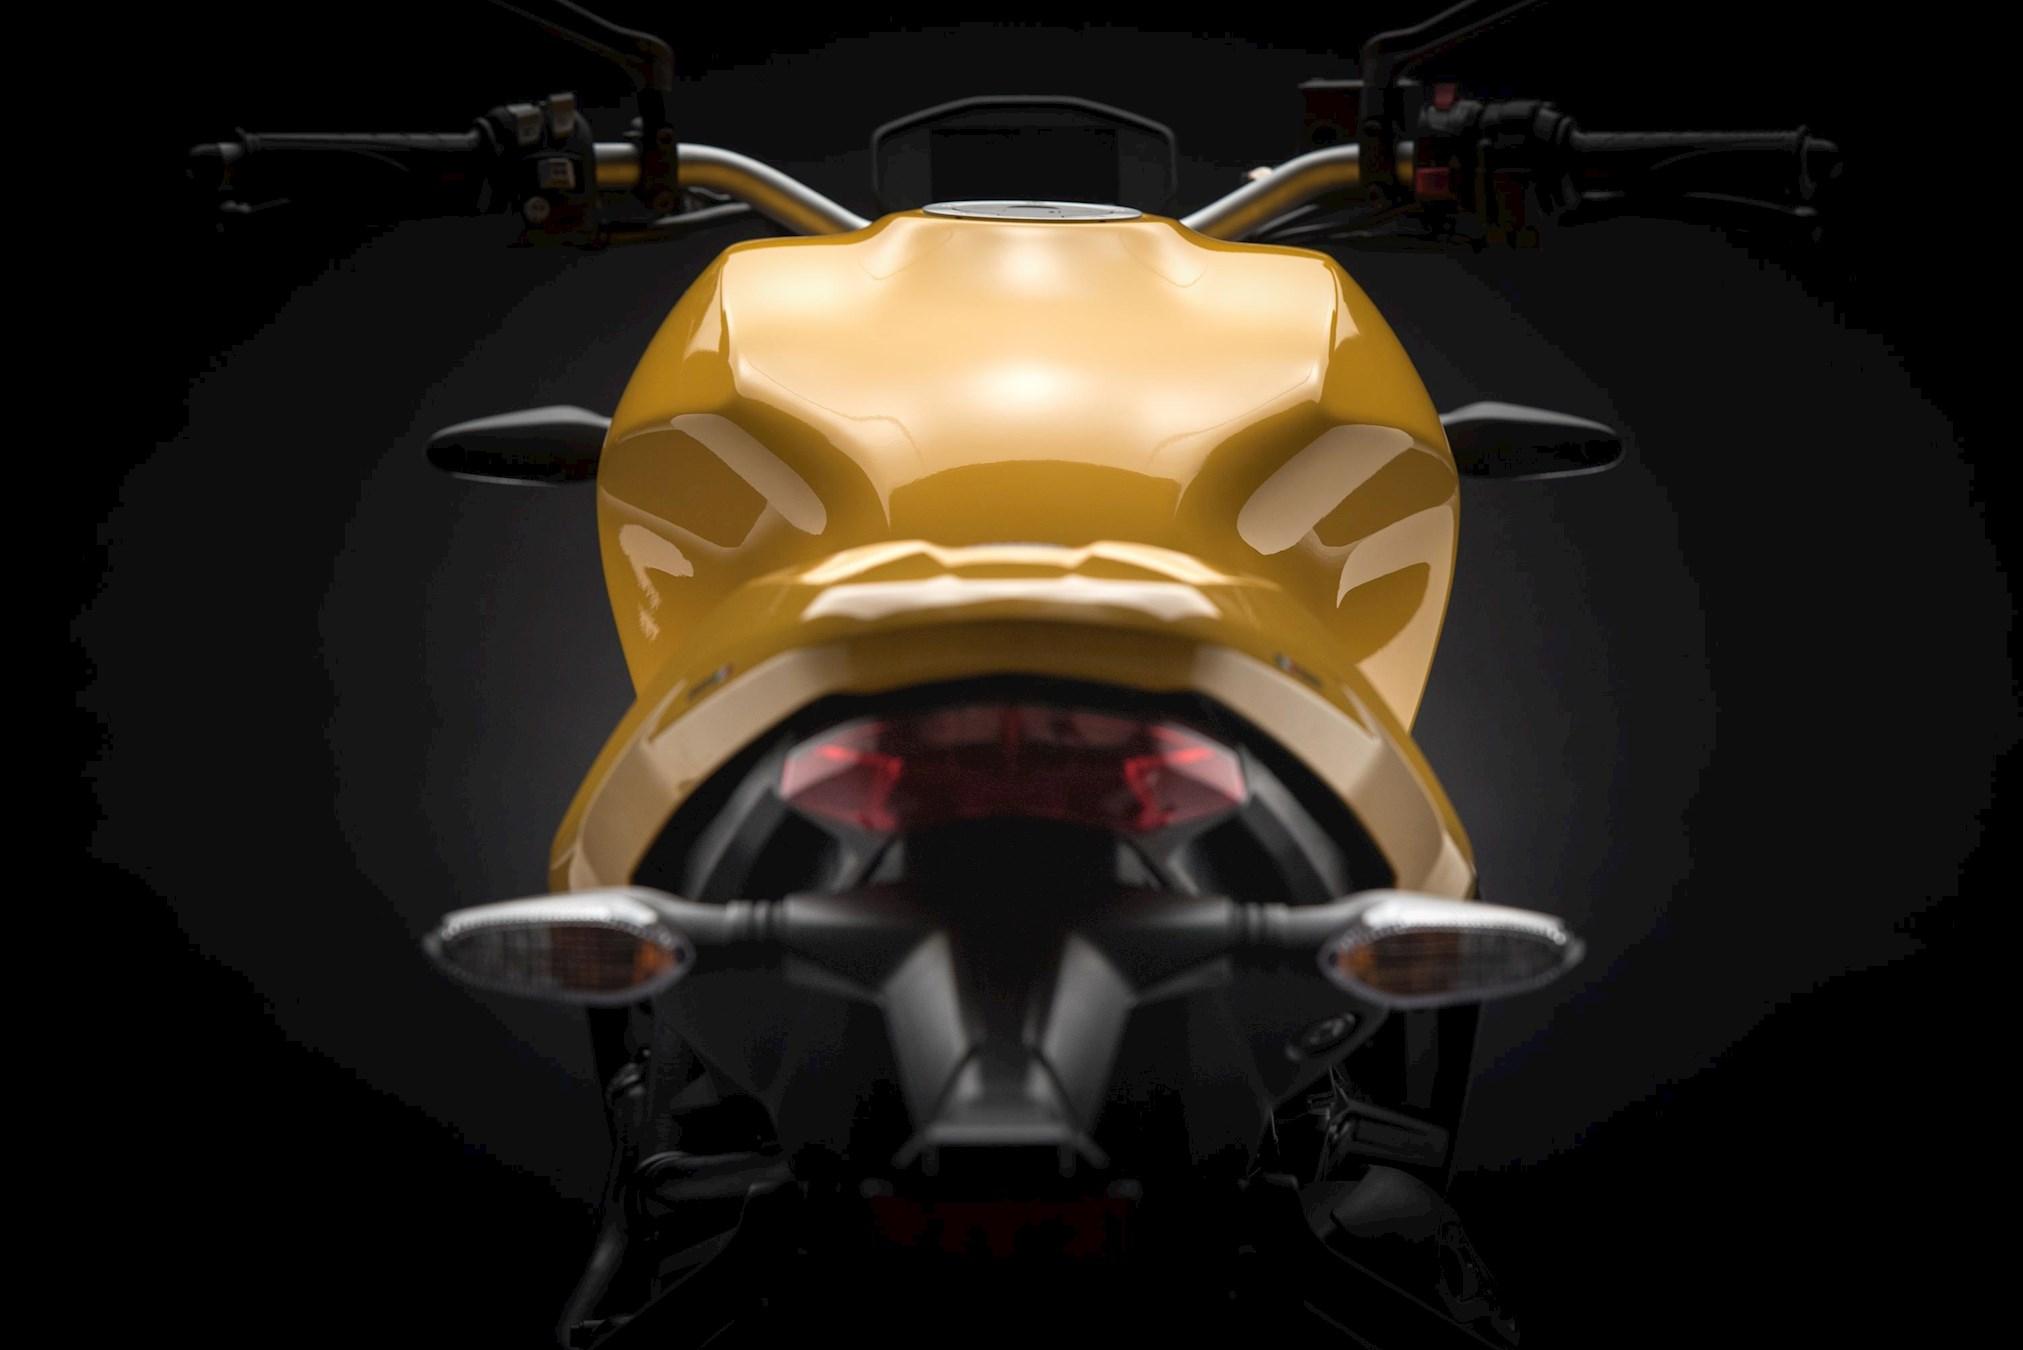 МОТОЦИКЛ DUCATI MONSTER 821 2018  Артмото - купить квадроцикл в украине и харькове, мотоцикл, снегоход, скутер, мопед, электромобиль